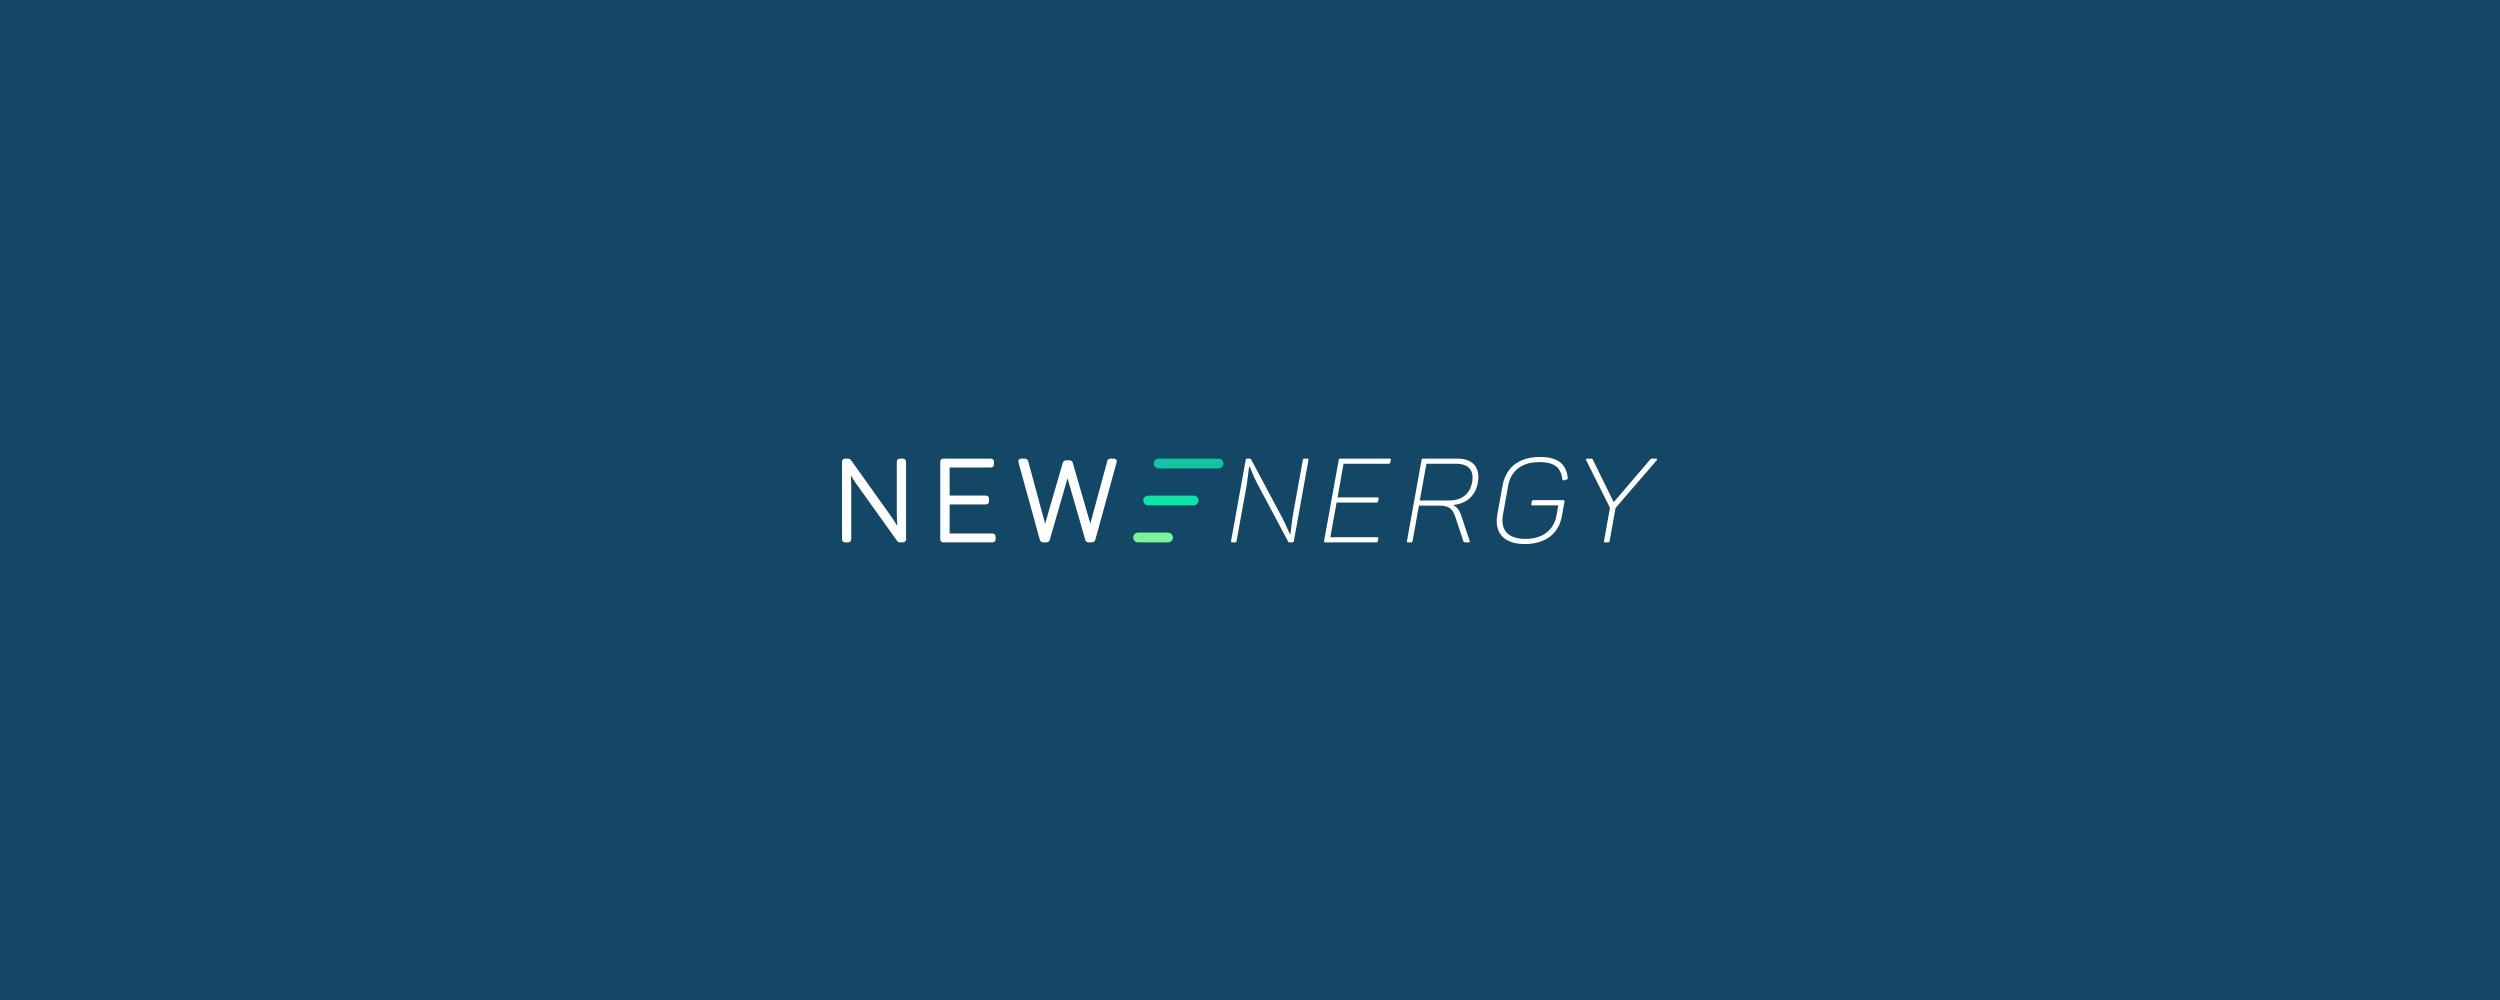 New-Energy2.jpg